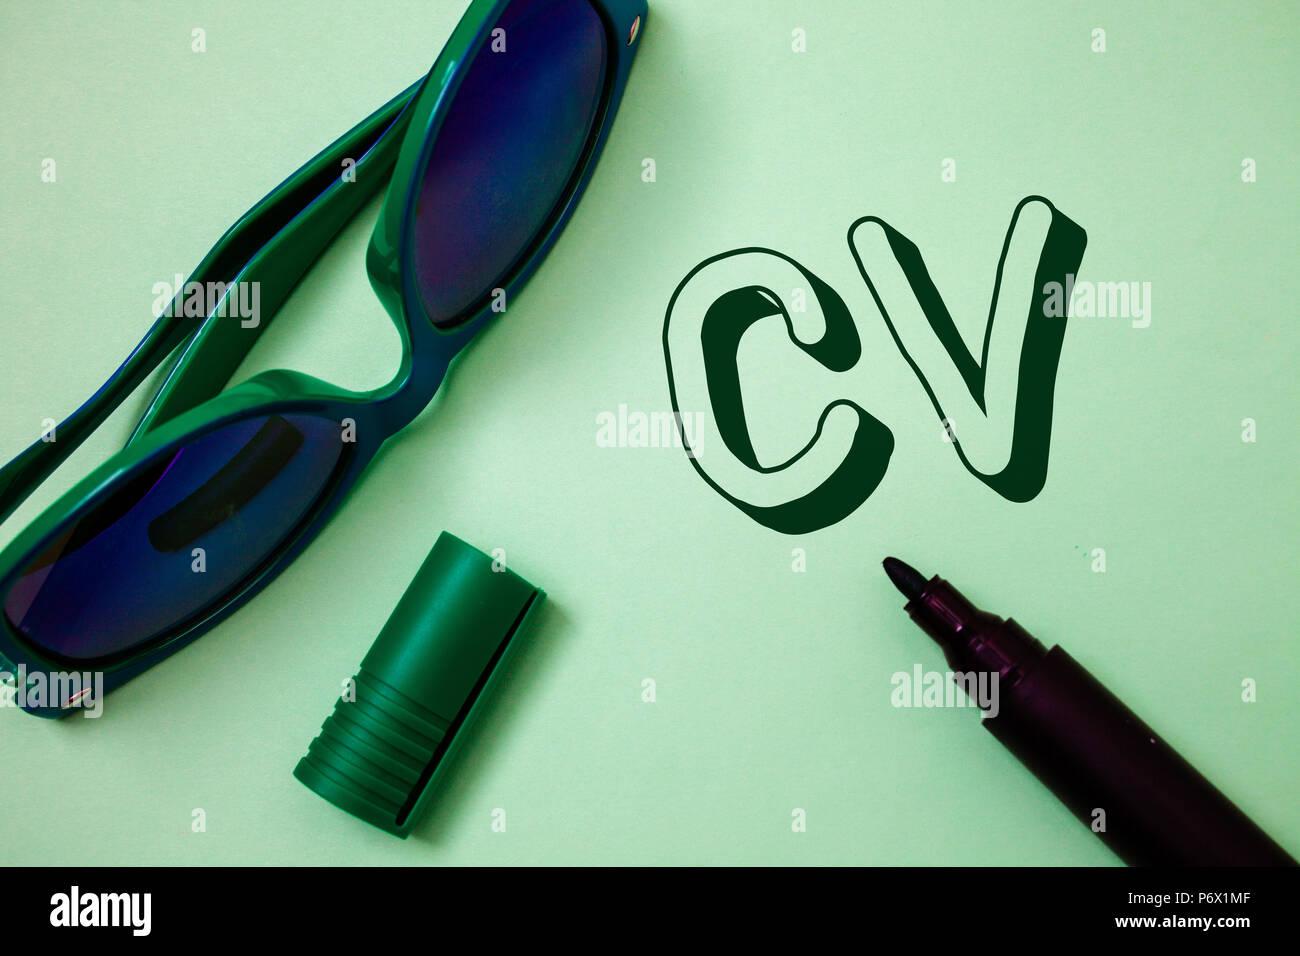 Cv Writing Imágenes De Stock & Cv Writing Fotos De Stock - Alamy